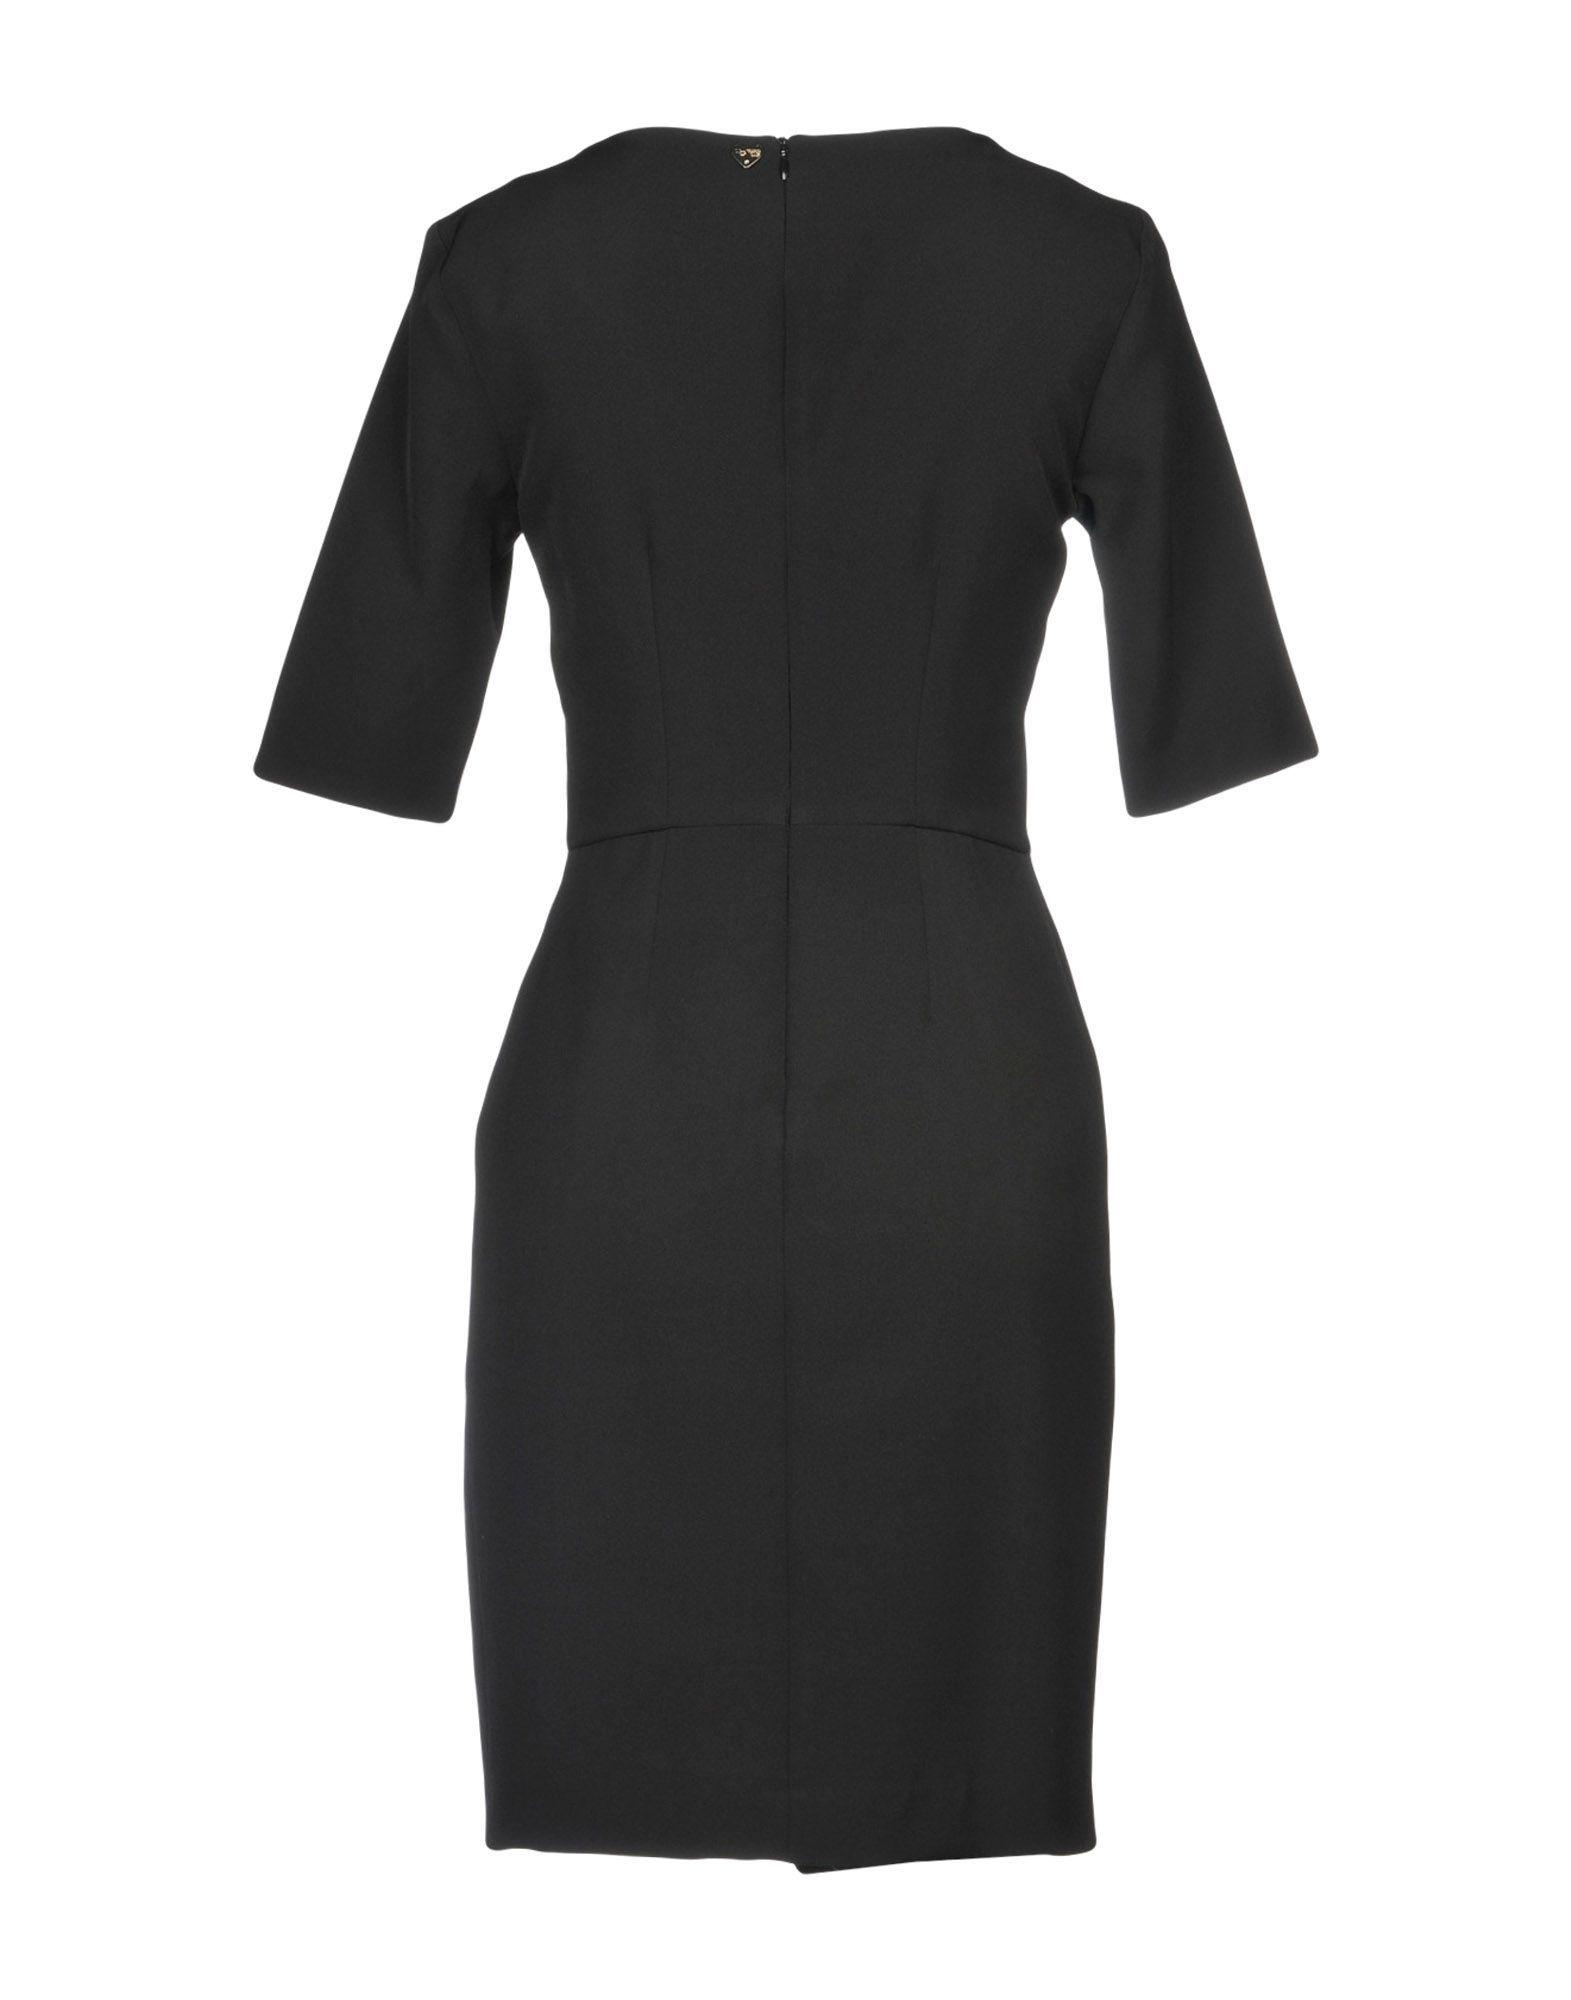 Blugirl Blumarine Black Crepe Short Sleeve Dress